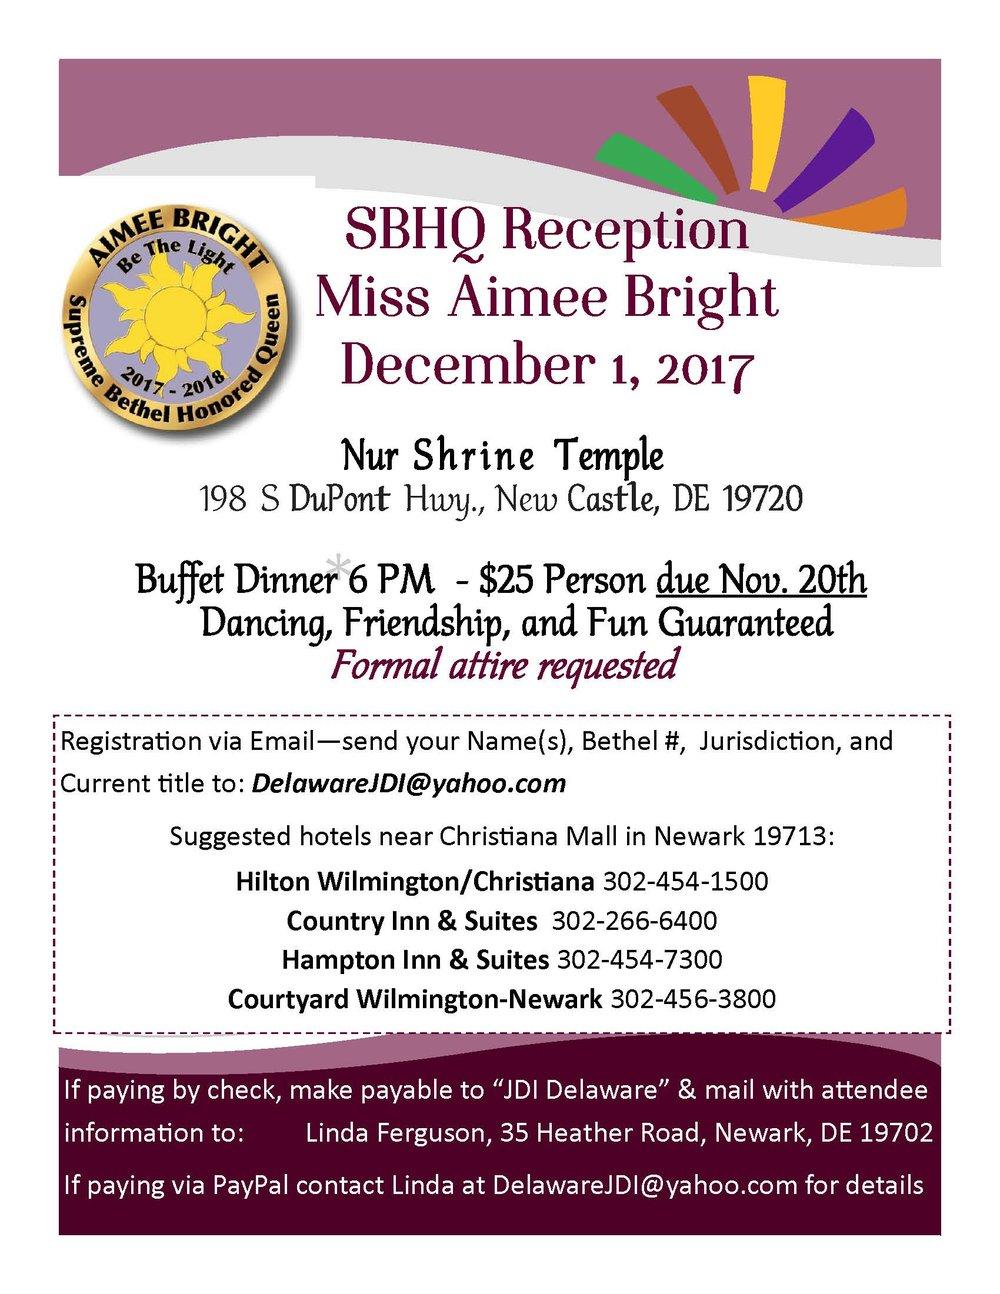 SBHQ Reception.jpg